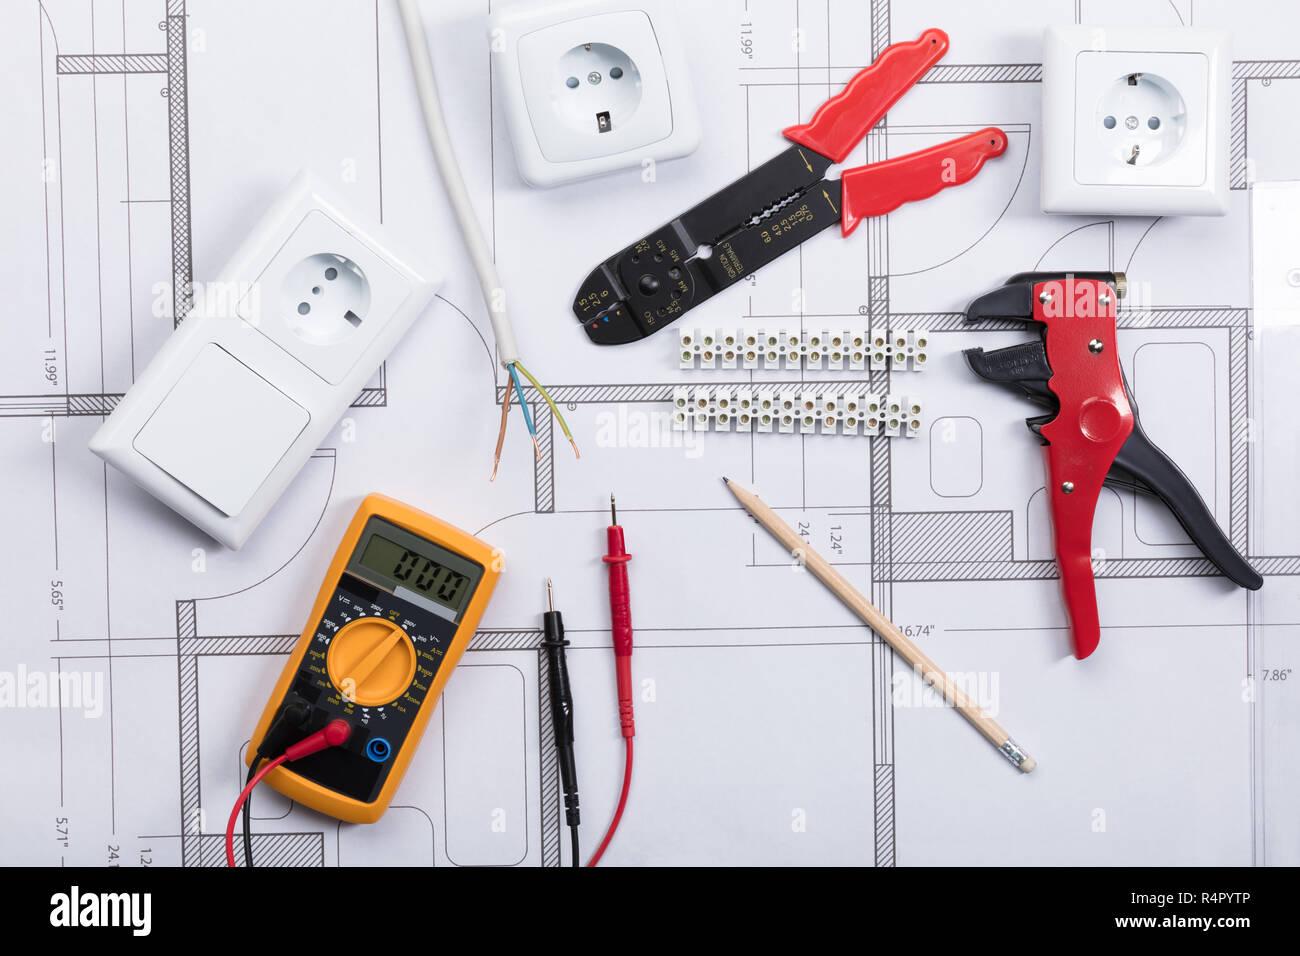 Blueprint Electrical Instrument Tools Stock Photos Blueprint